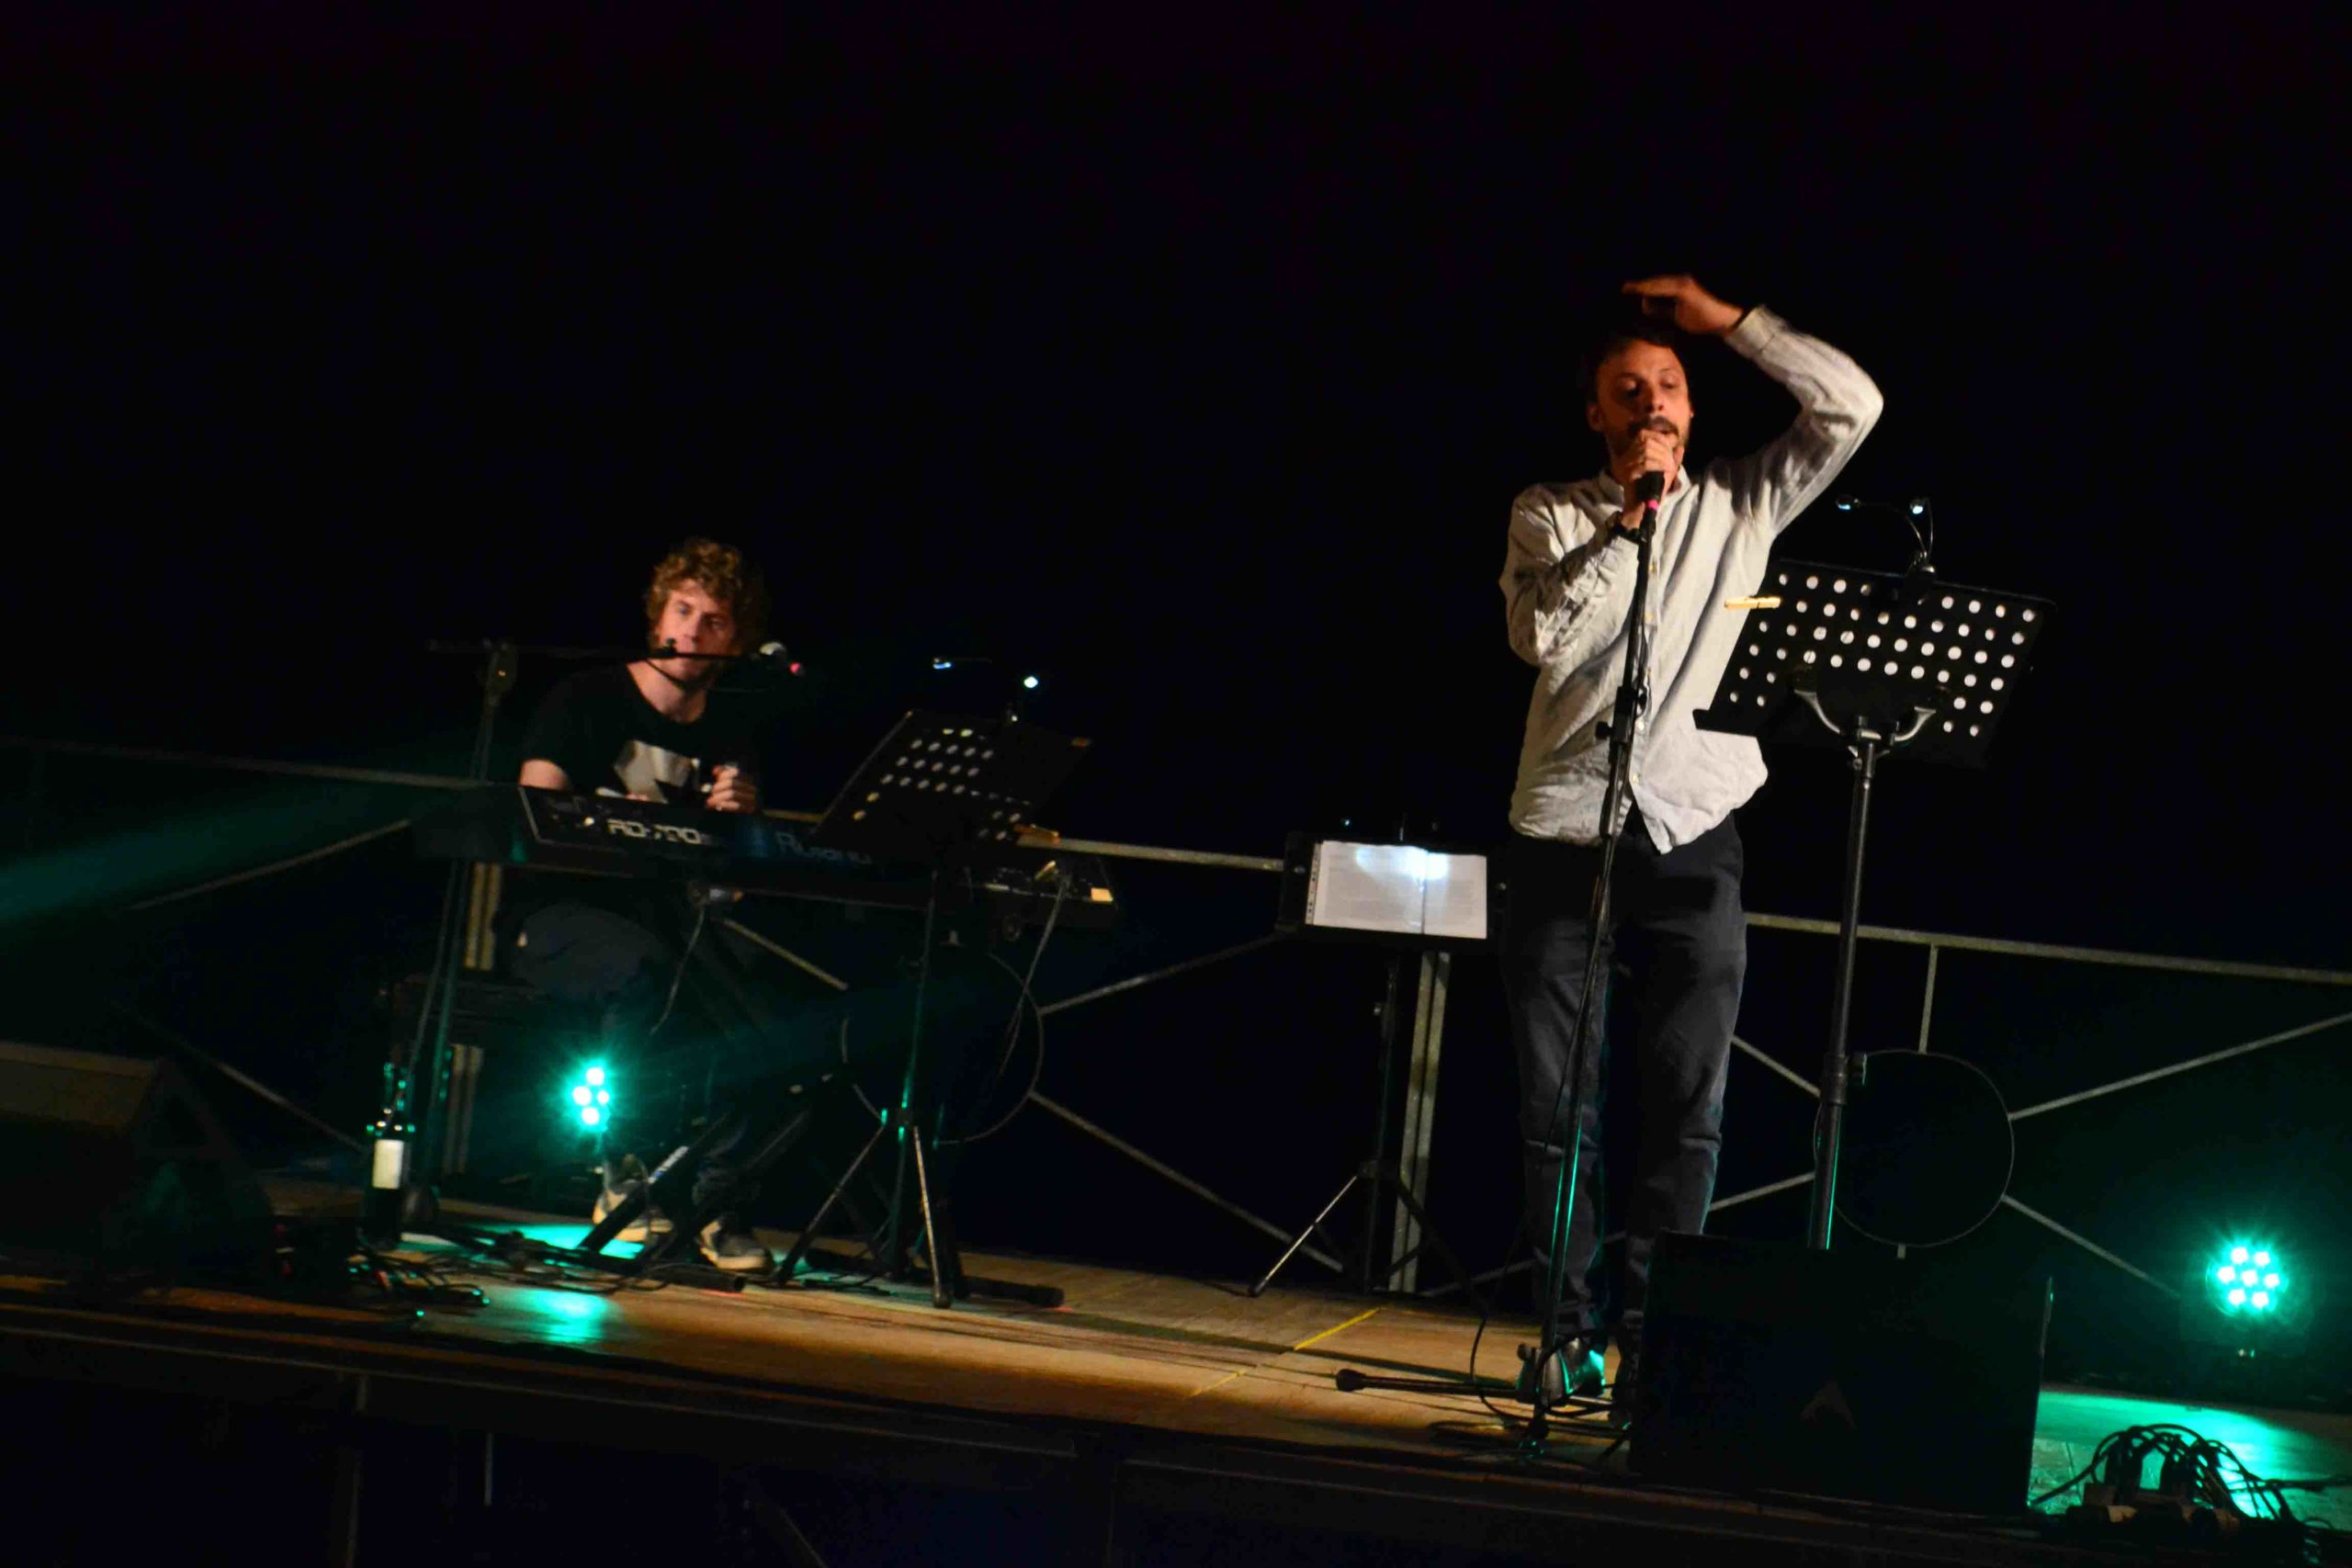 Lodo Guenzi e Federico Borghesi sul palco